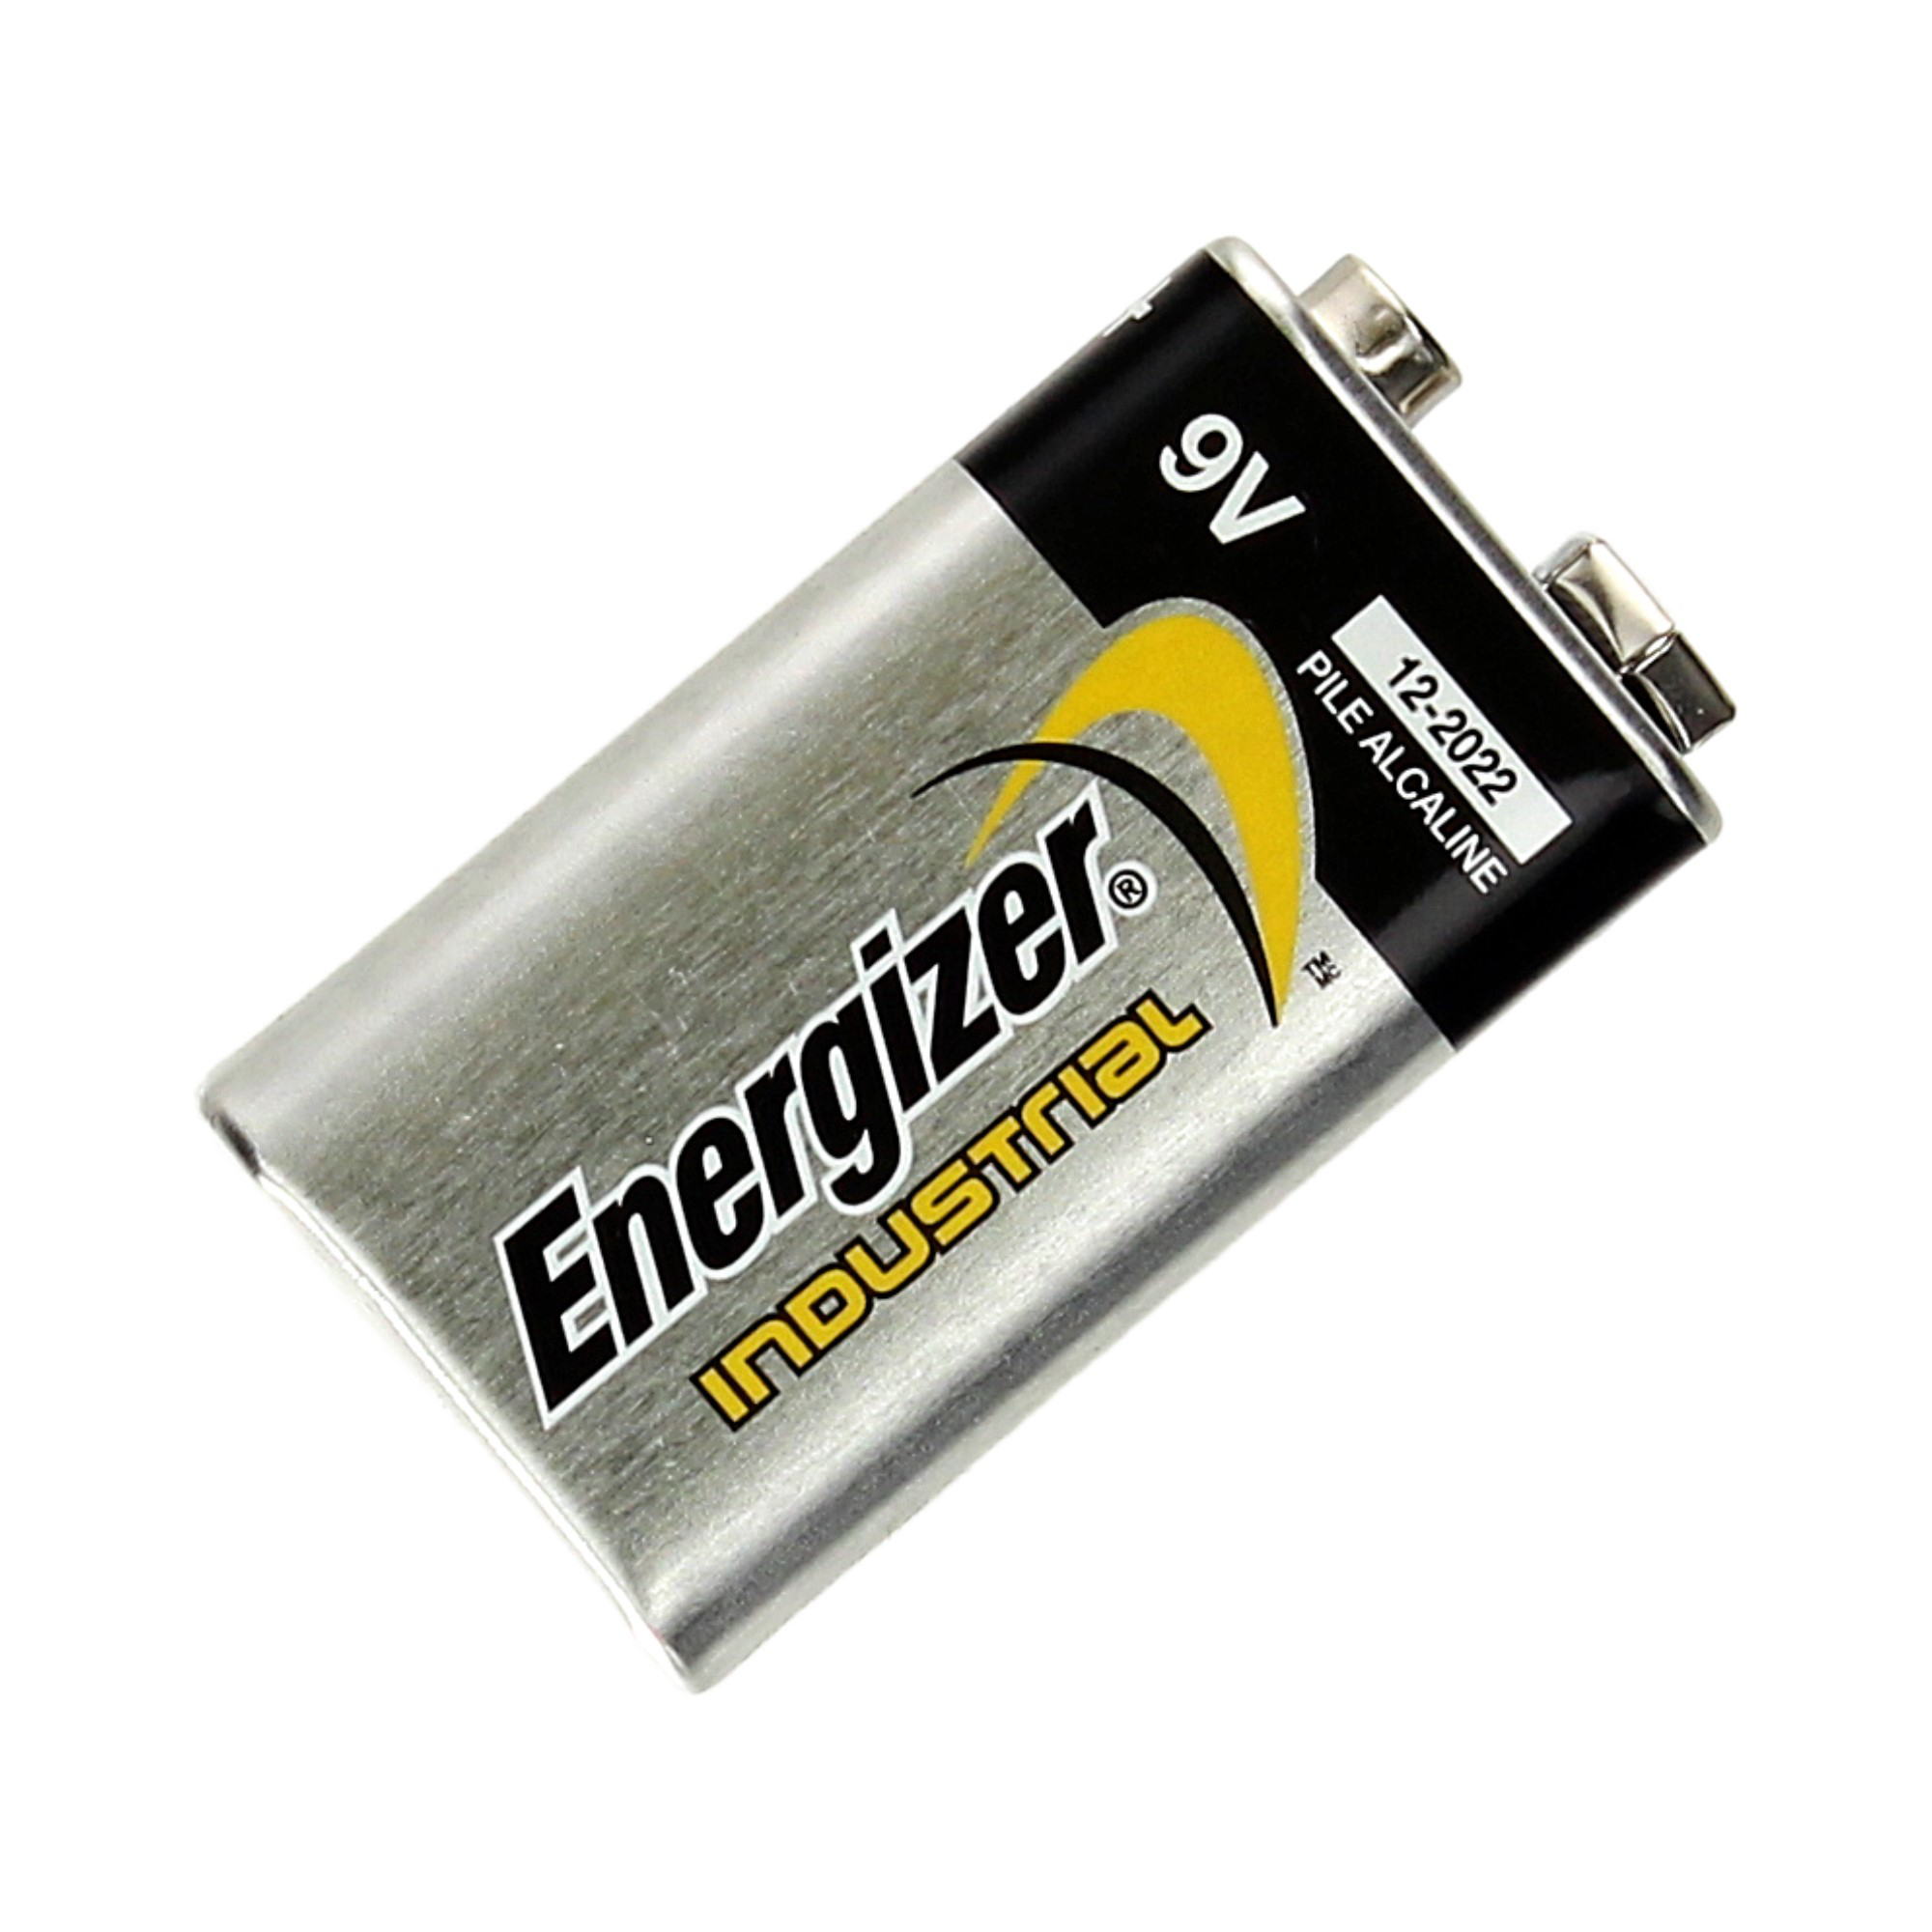 Bateria alkaliczna 6LR61 9V Industrial Energizer